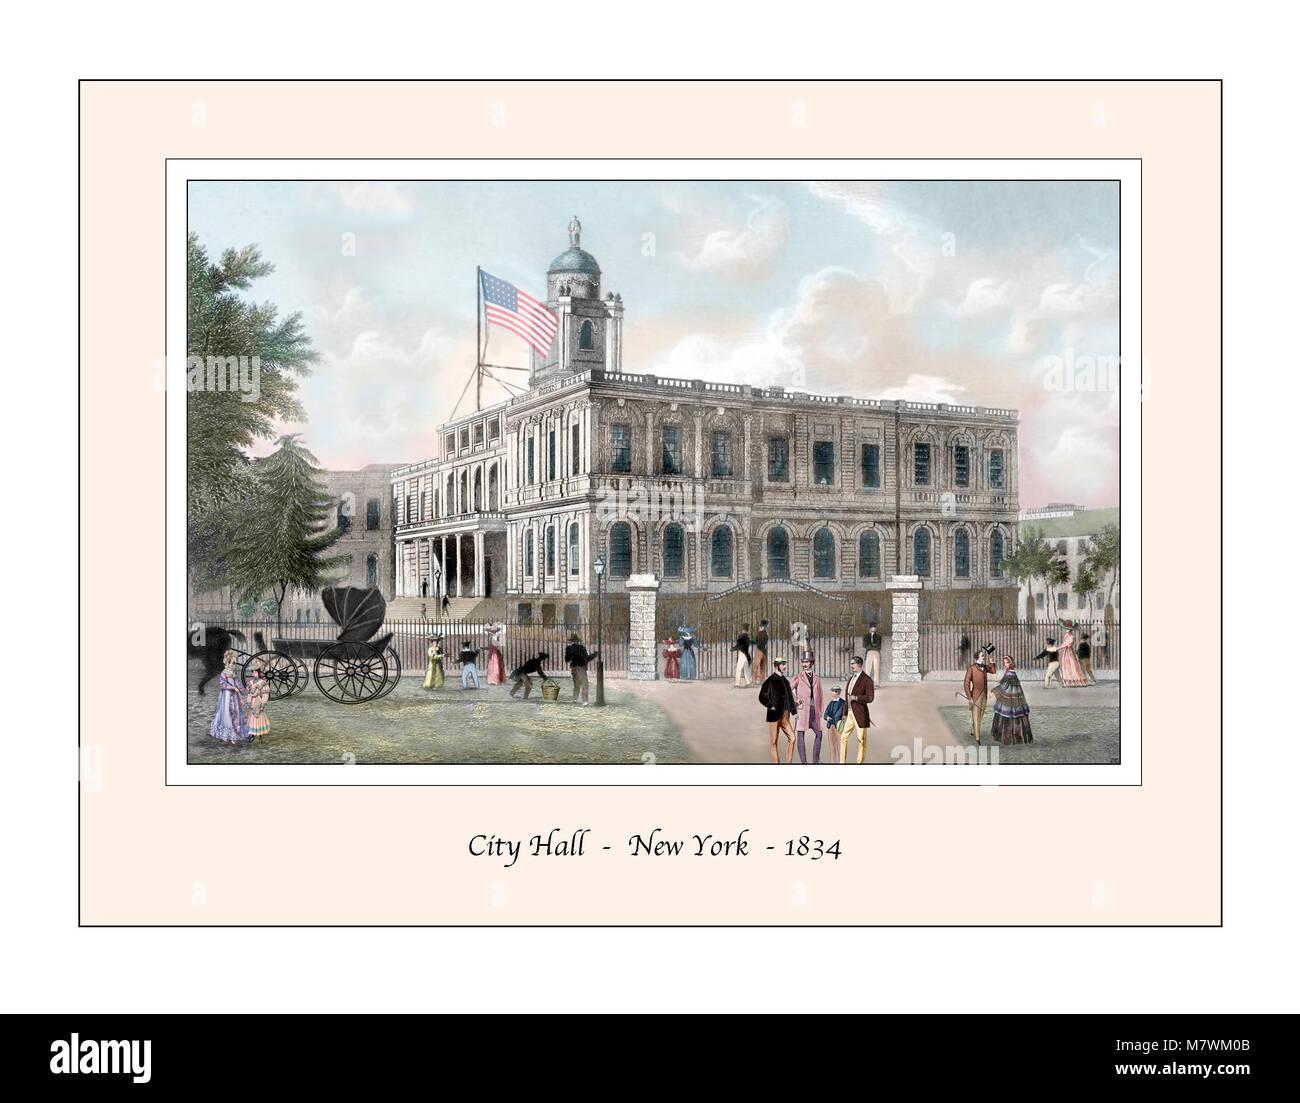 City Hall New York Original Design based on a 19th century Engraving - Stock Image